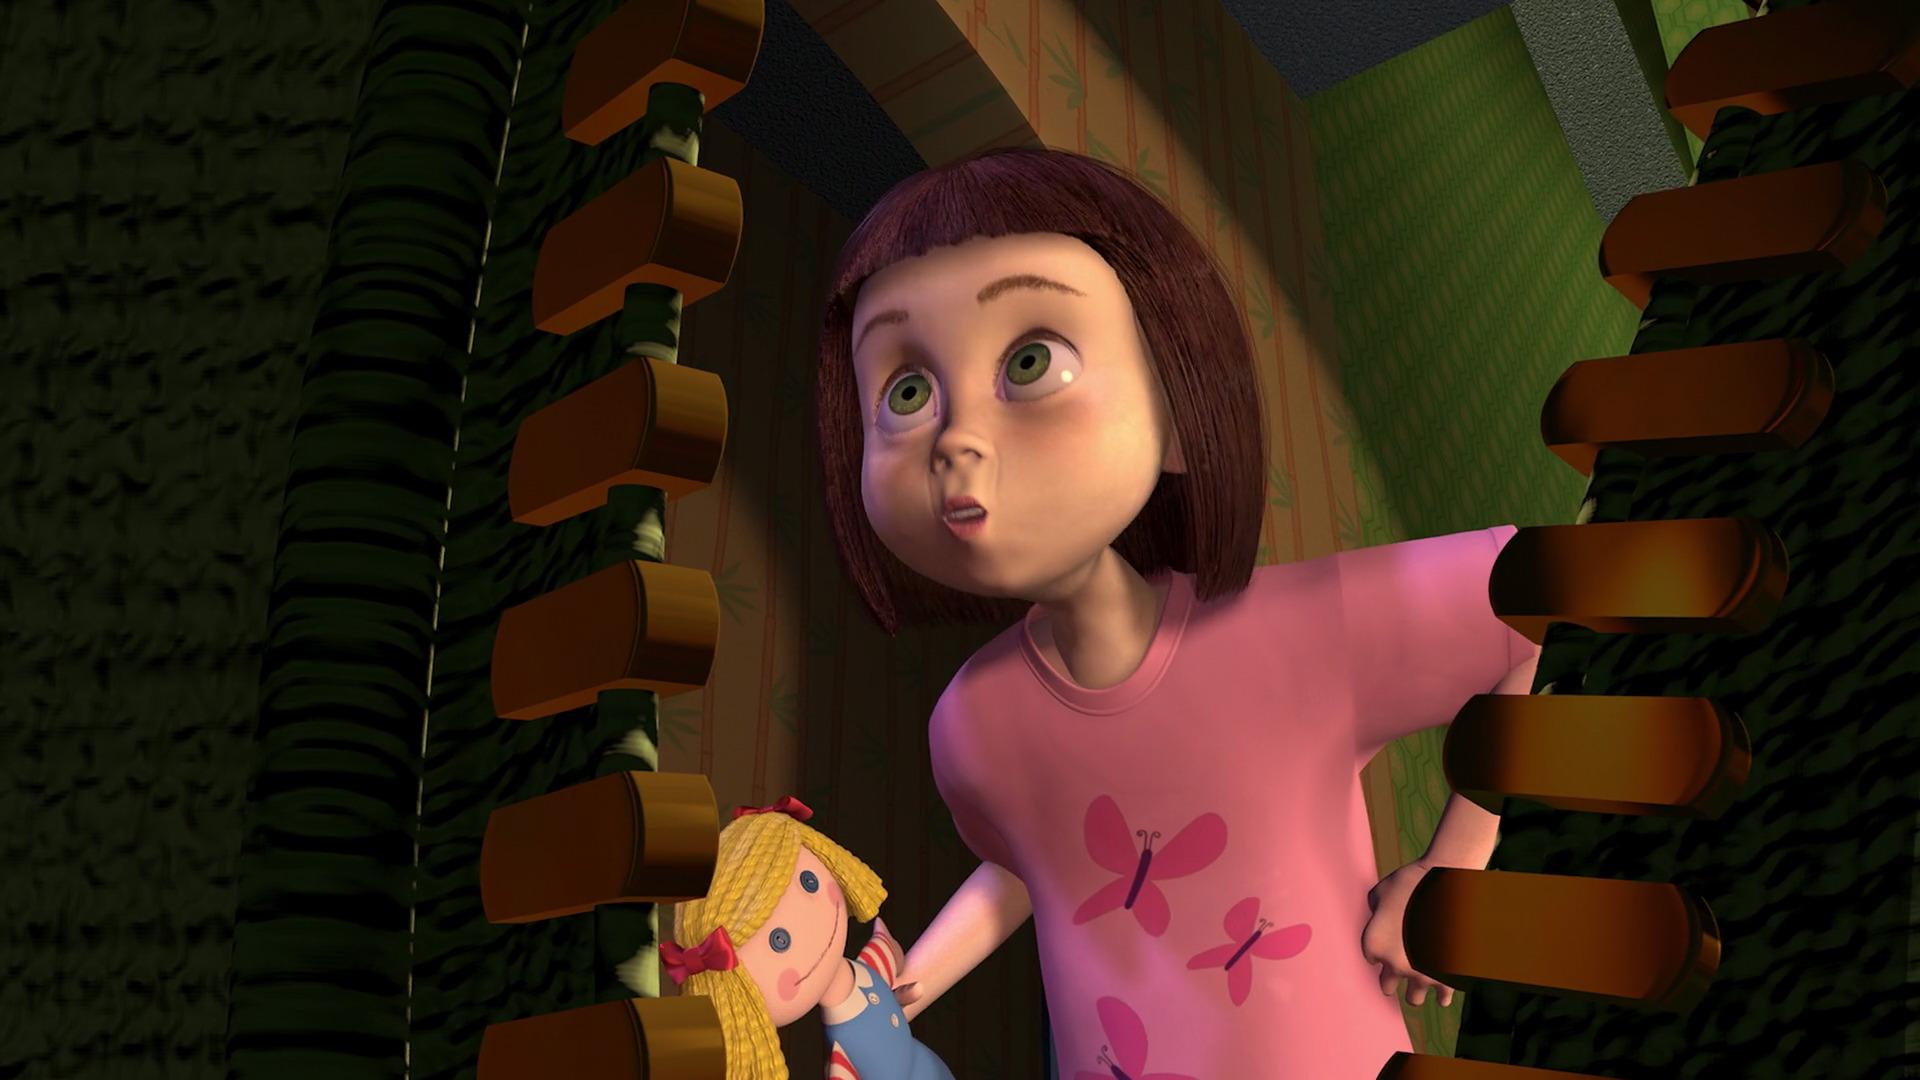 Toy Story Hannah : Image toy story disneyscreencaps g disney